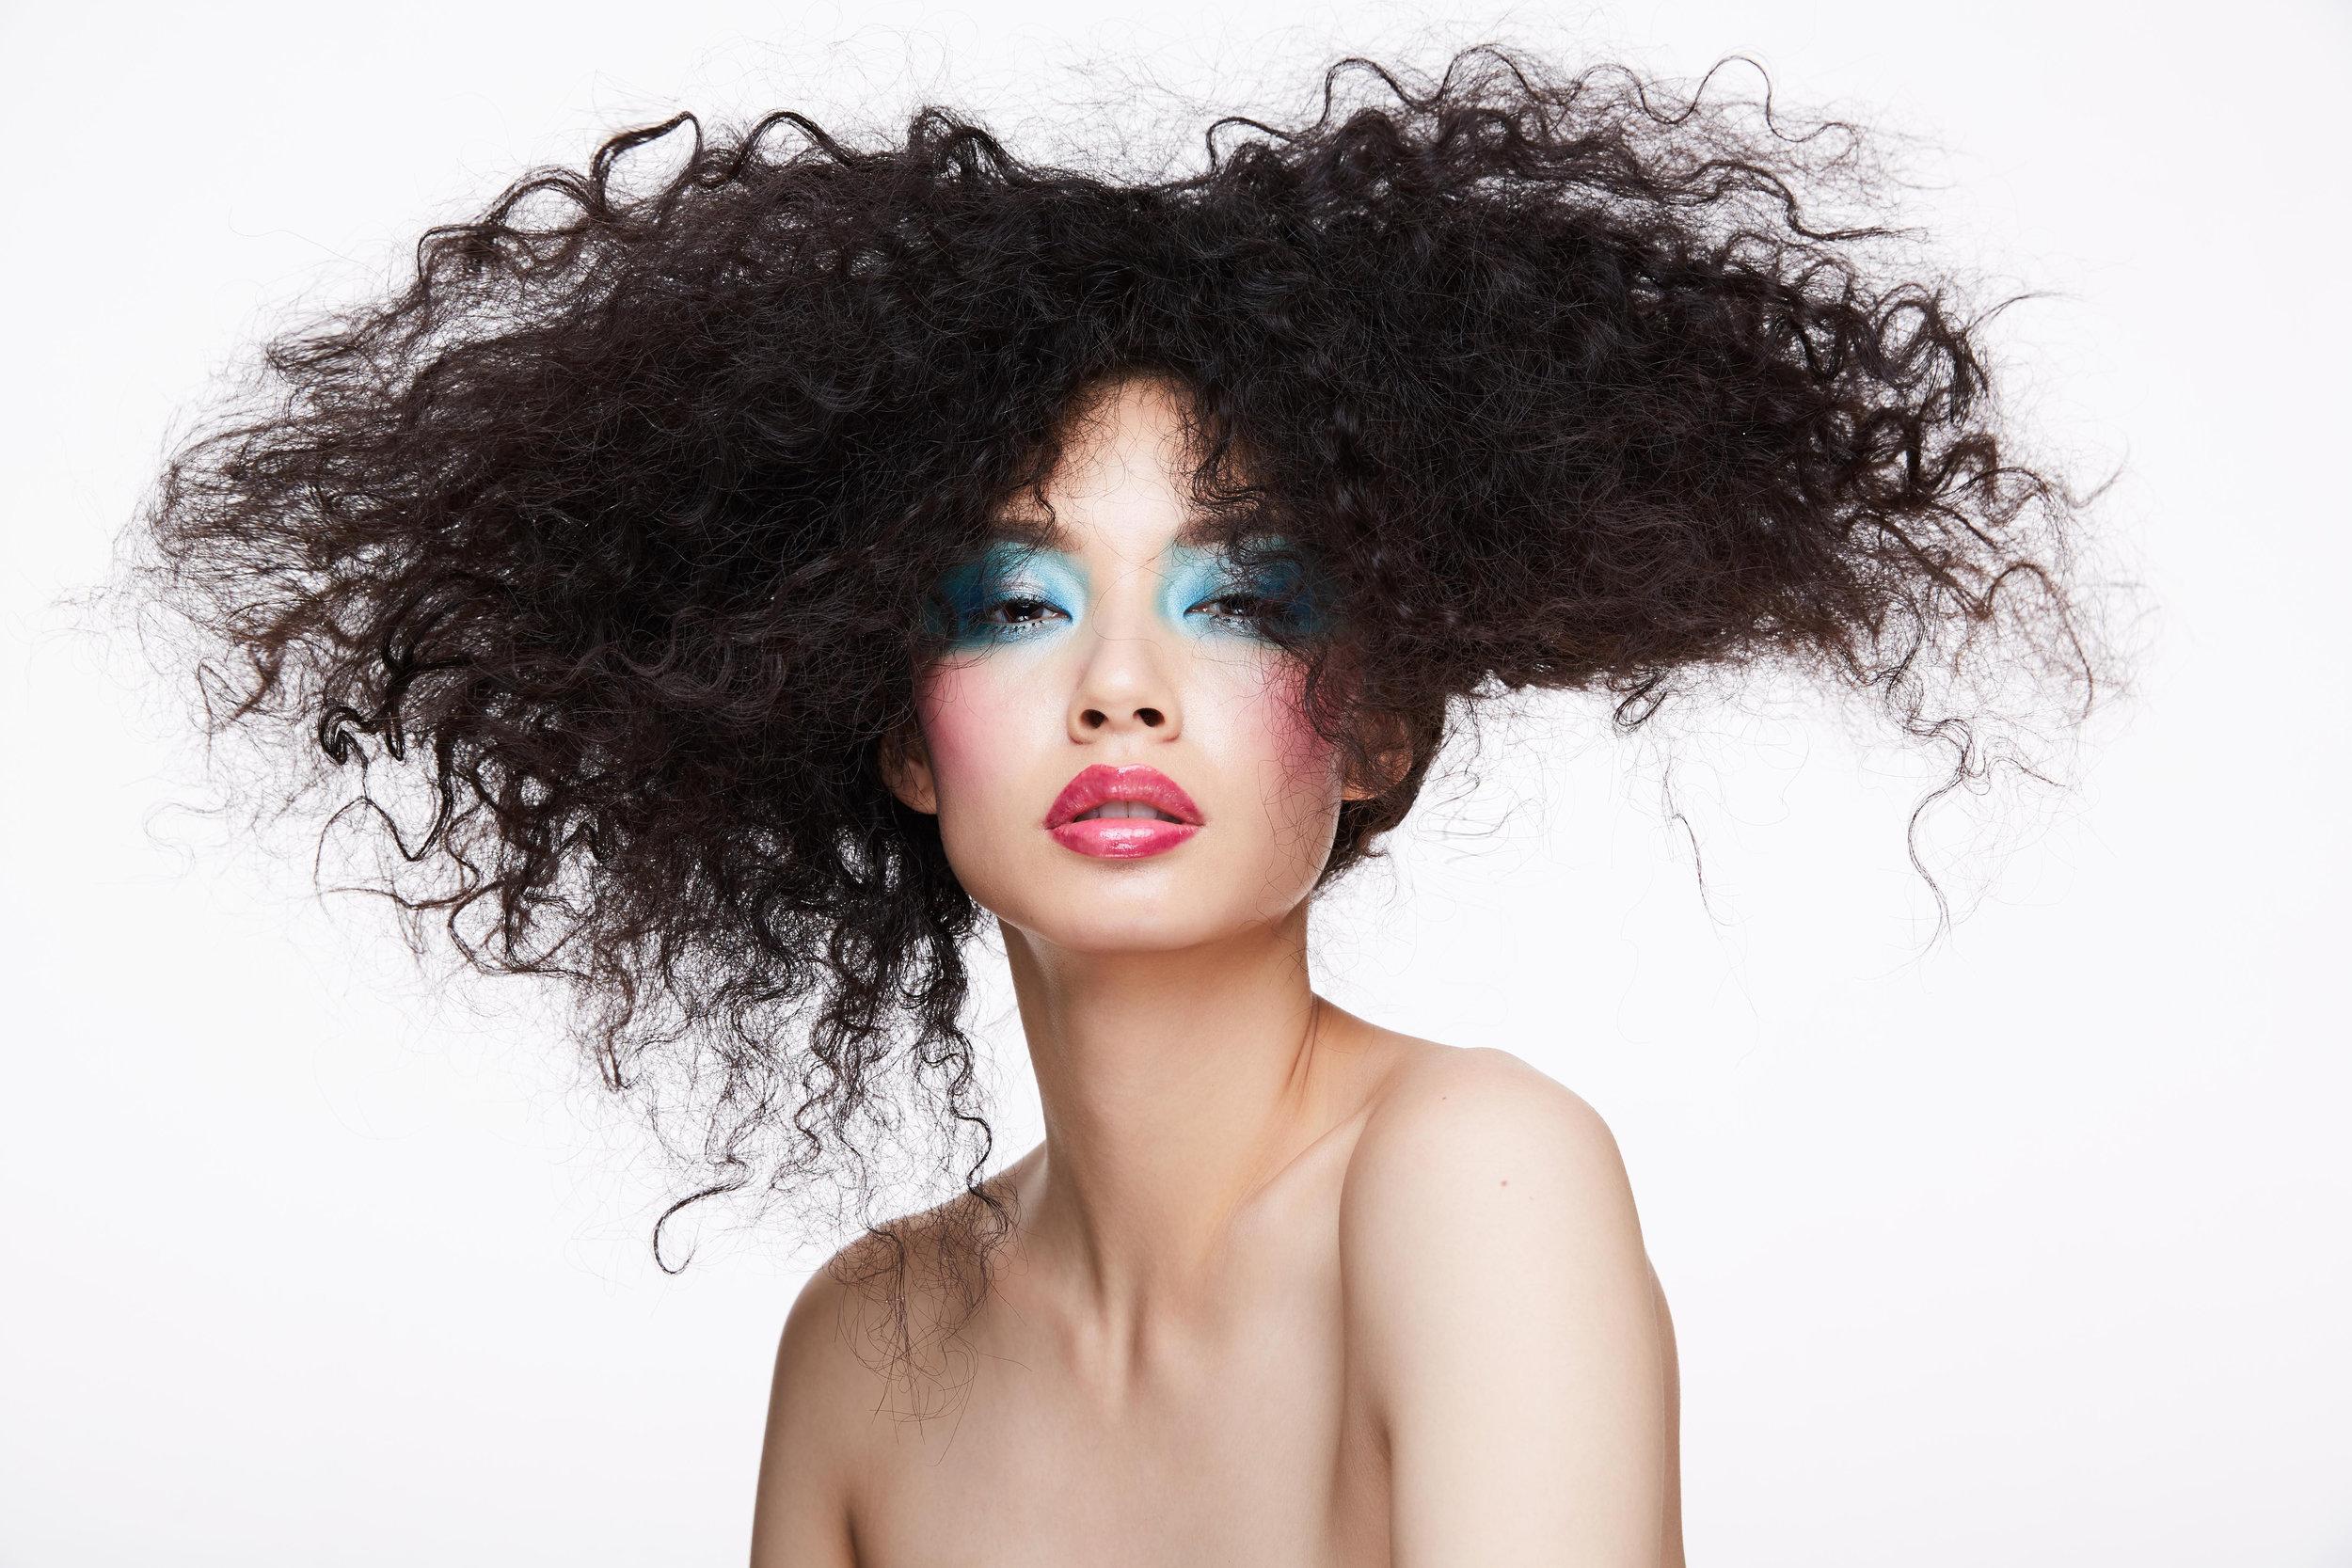 Hair by Dan Nguyen, Makeup by Niko. Shot by James Lee Wall.